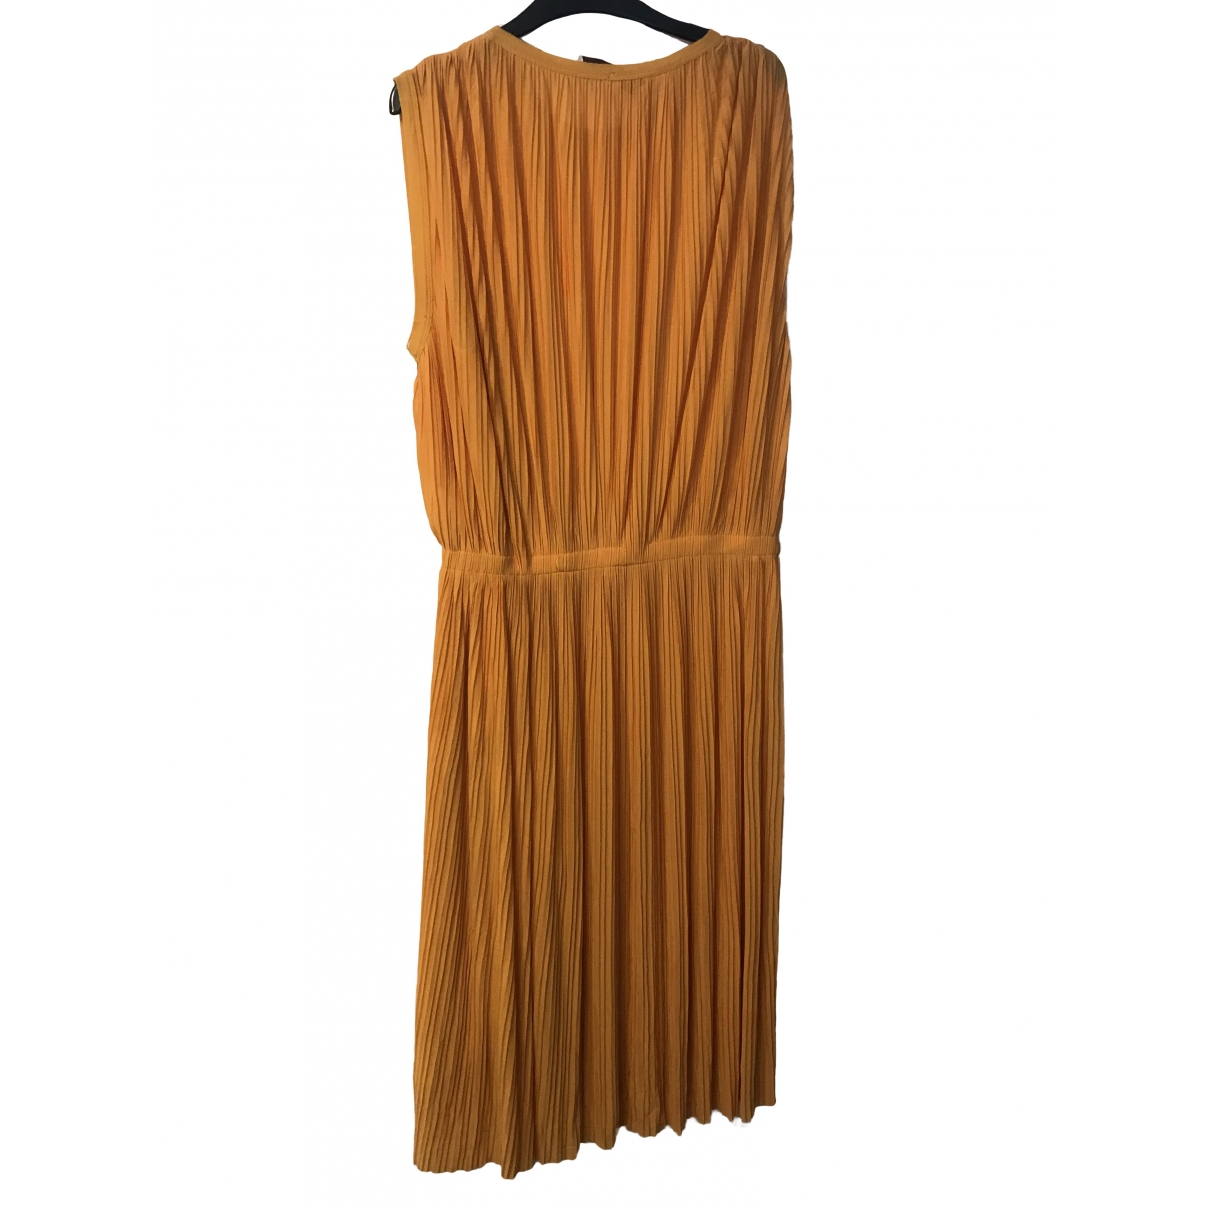 Stella Mccartney \N Kleid in  Gelb Polyester